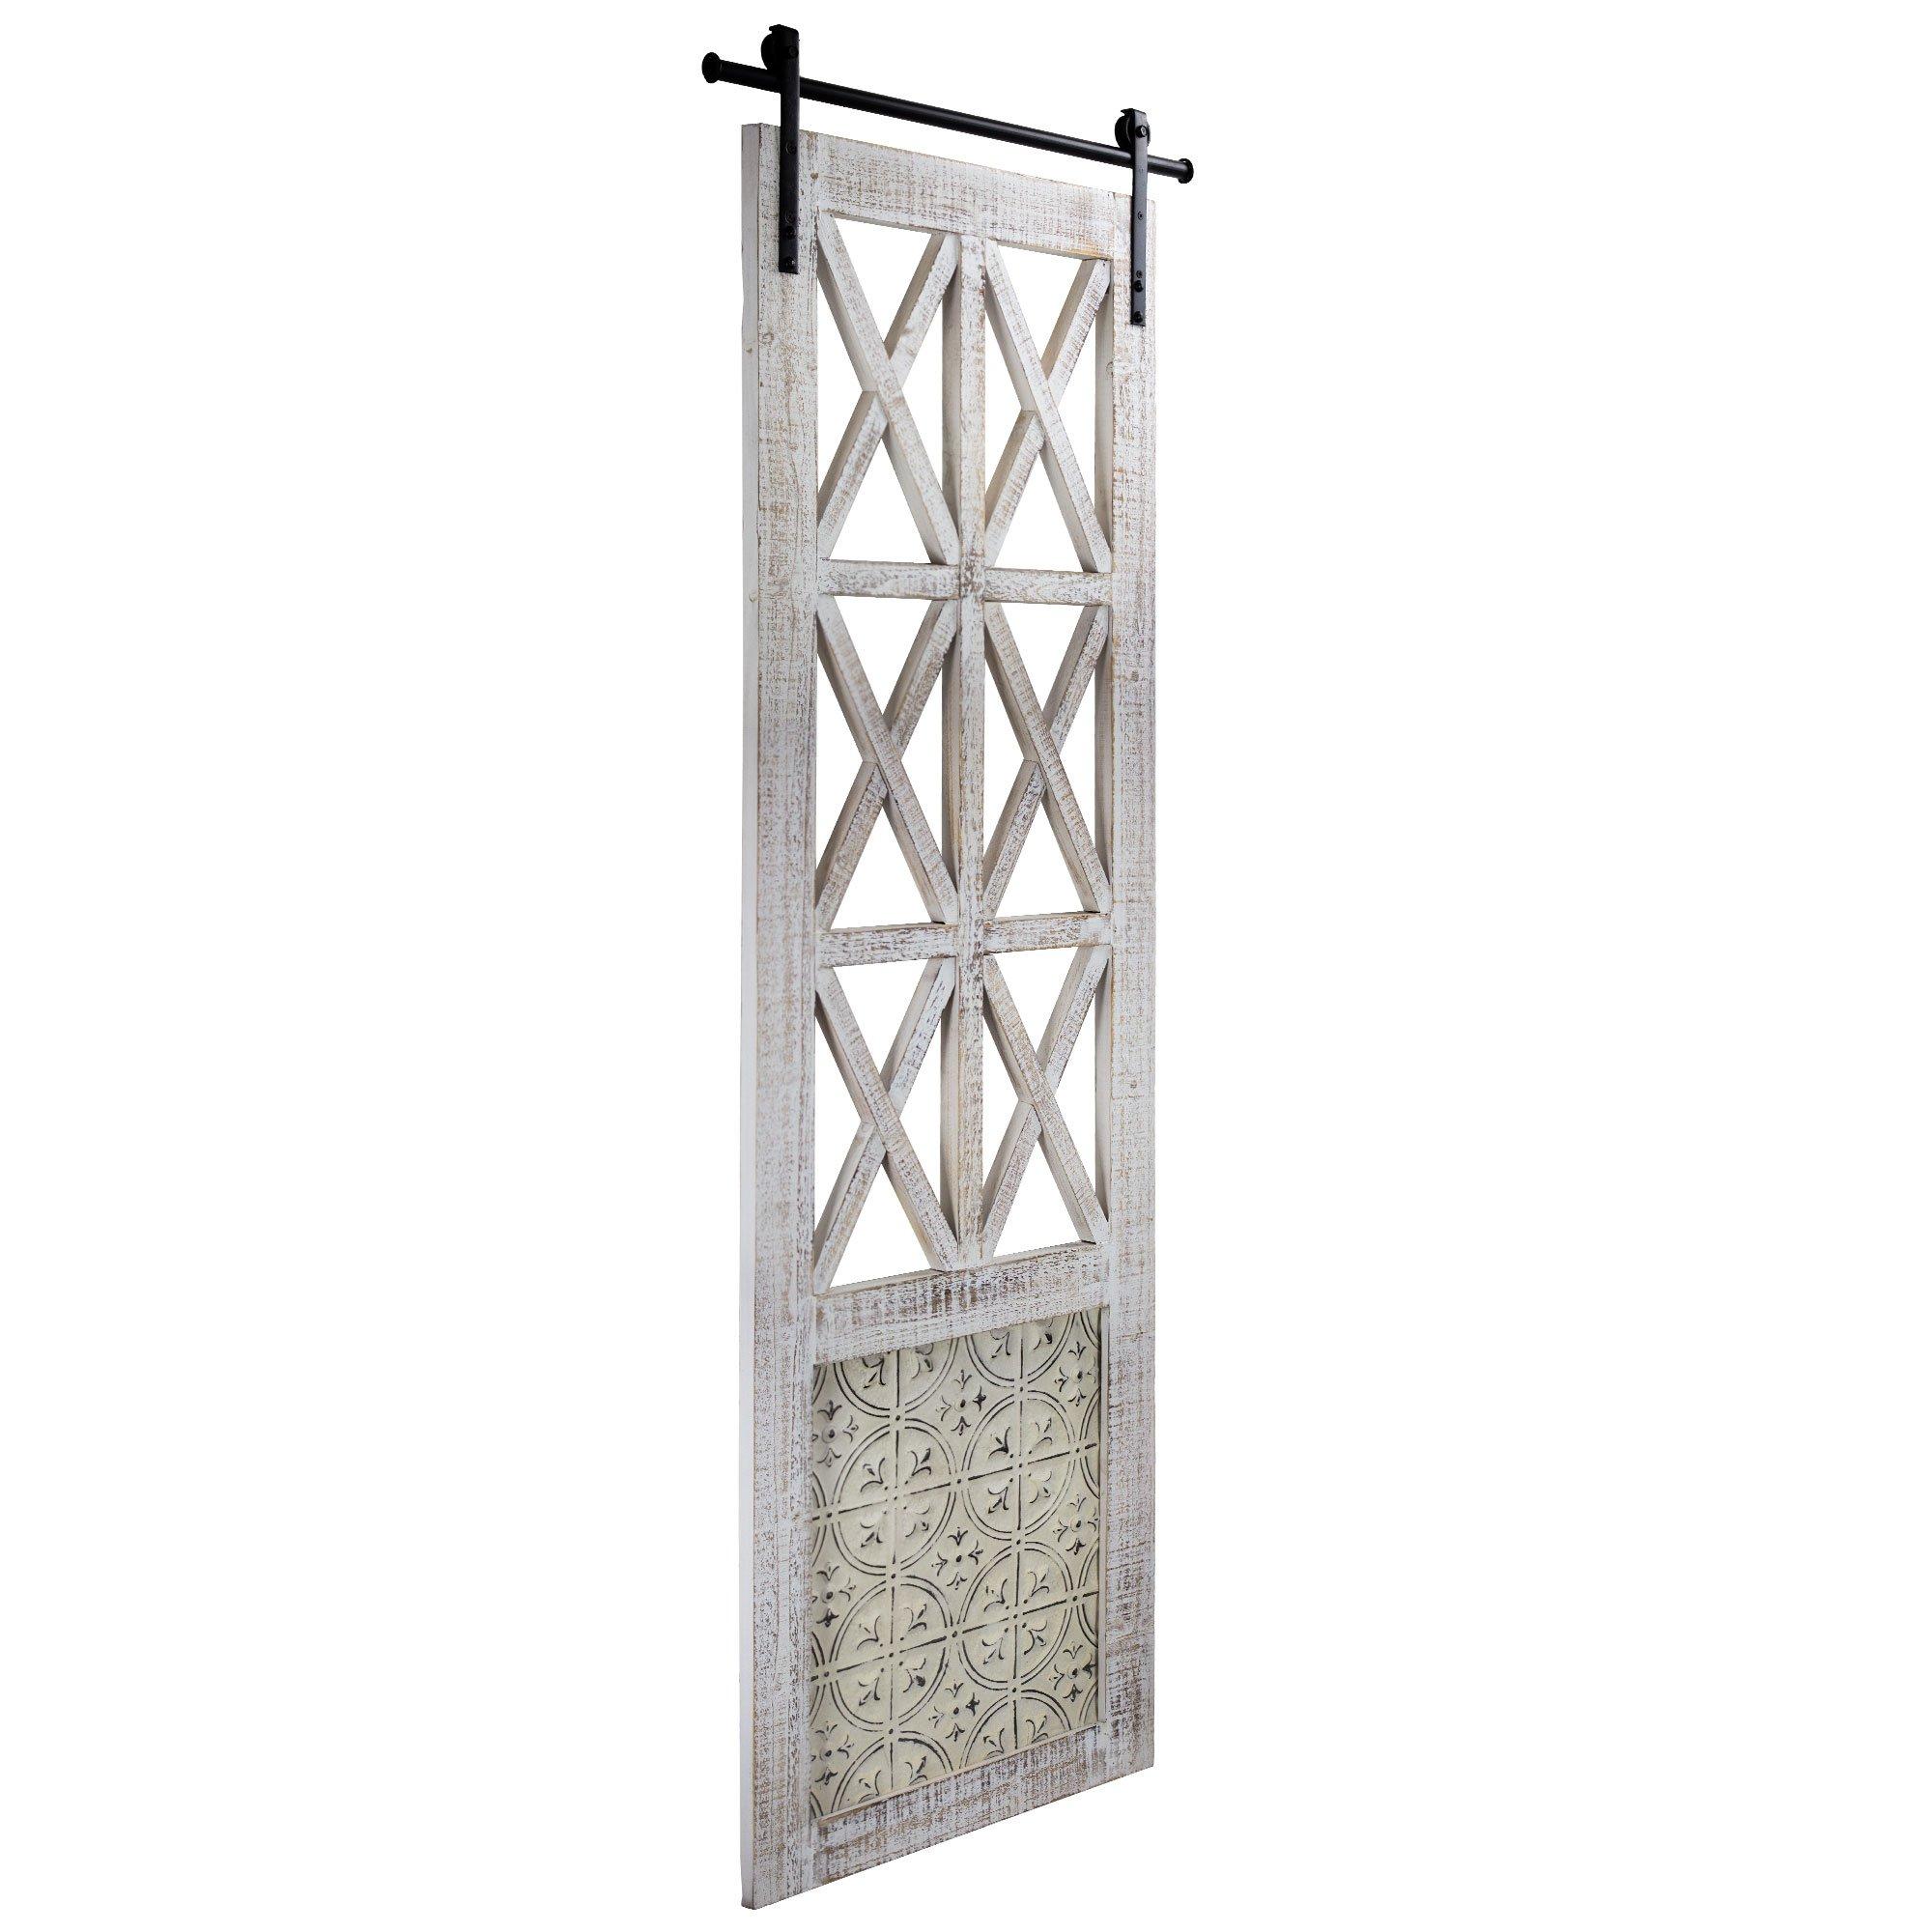 American Art Decor Whitewashed Wood Decorative Hanging Window Door Farmhouse Wall Decor